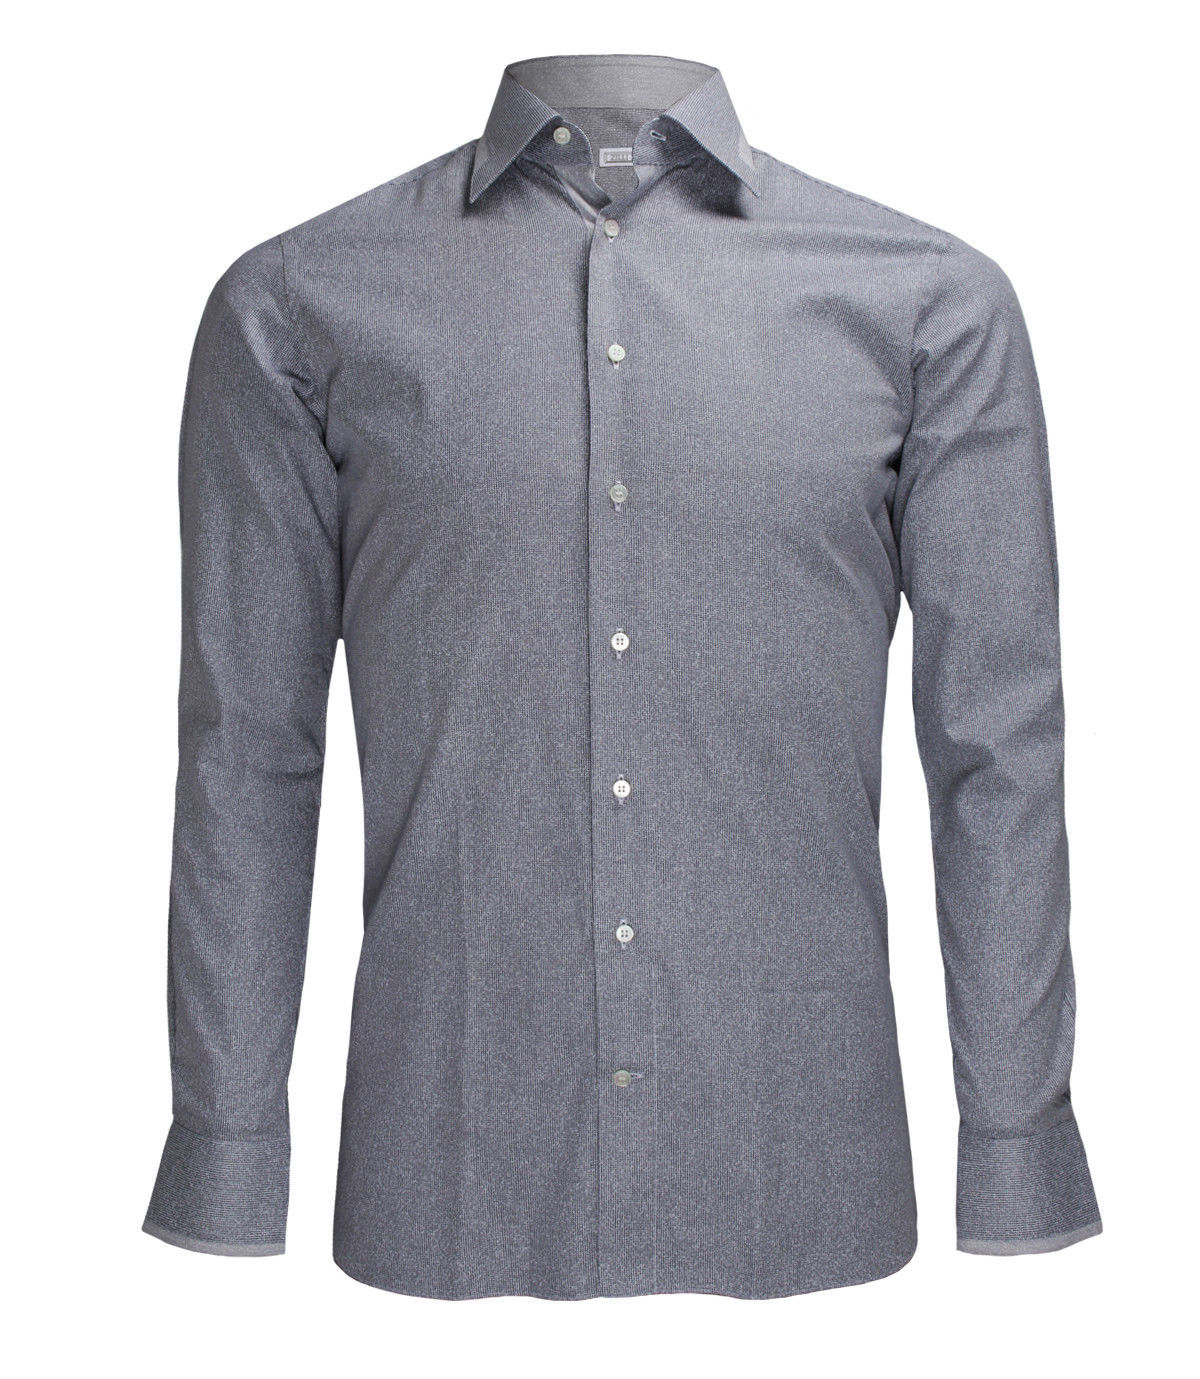 Zilli Men's Grey Patterned Cotton Dress Shirt Regular fit, size 40(15.75)